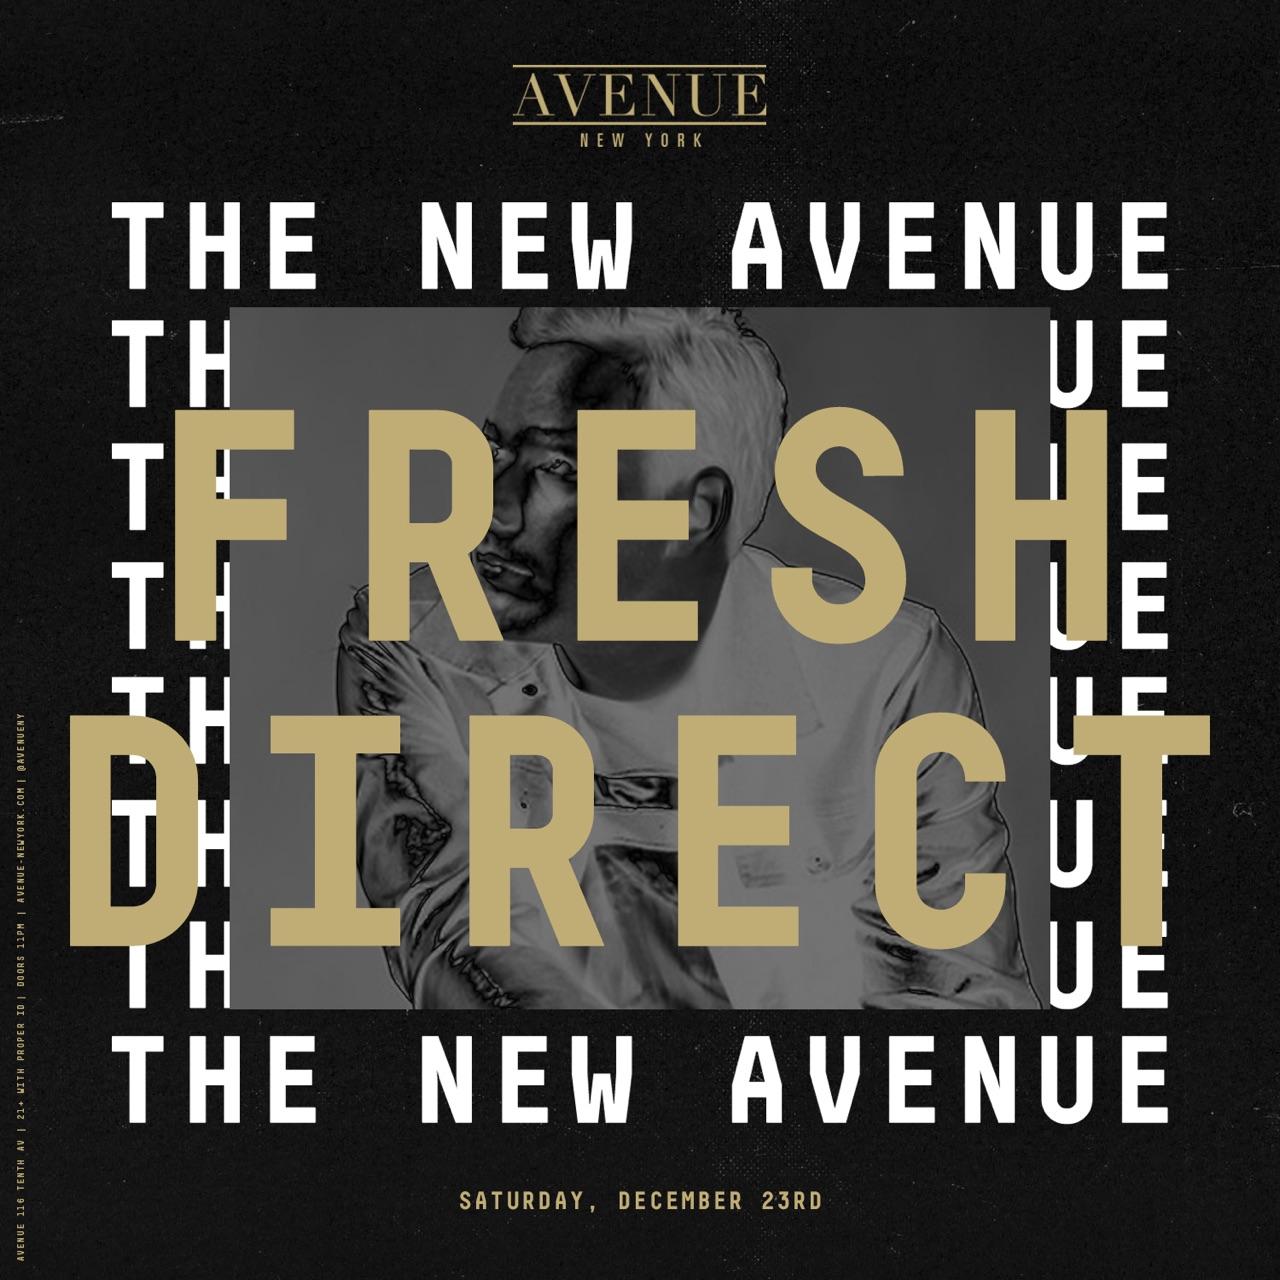 12-23-17 Avenue.JPG